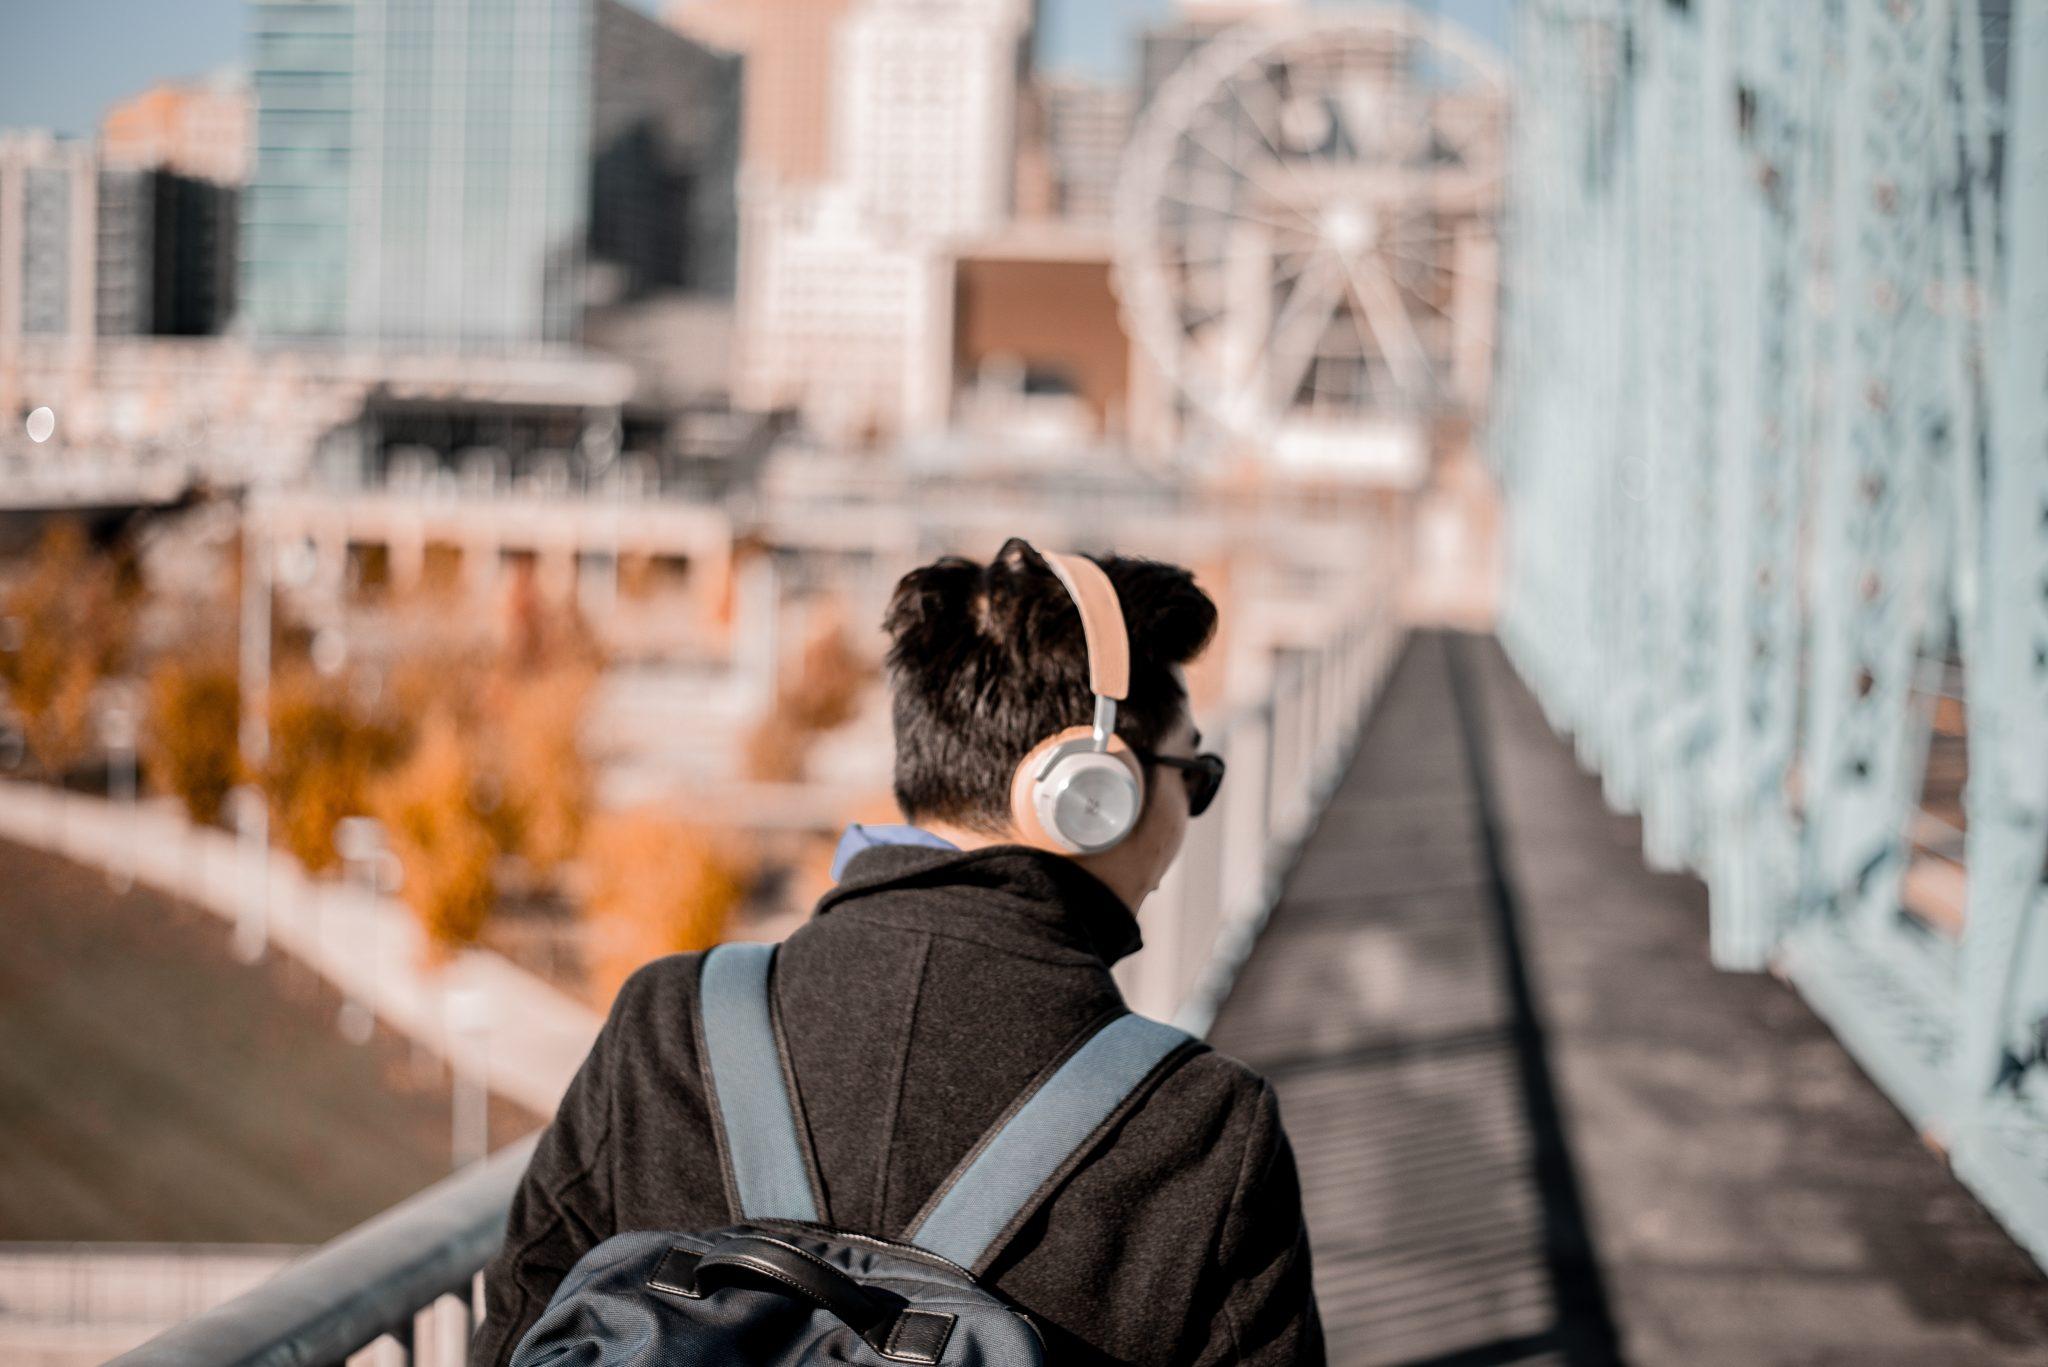 Man wearing headphones while walking toward a city